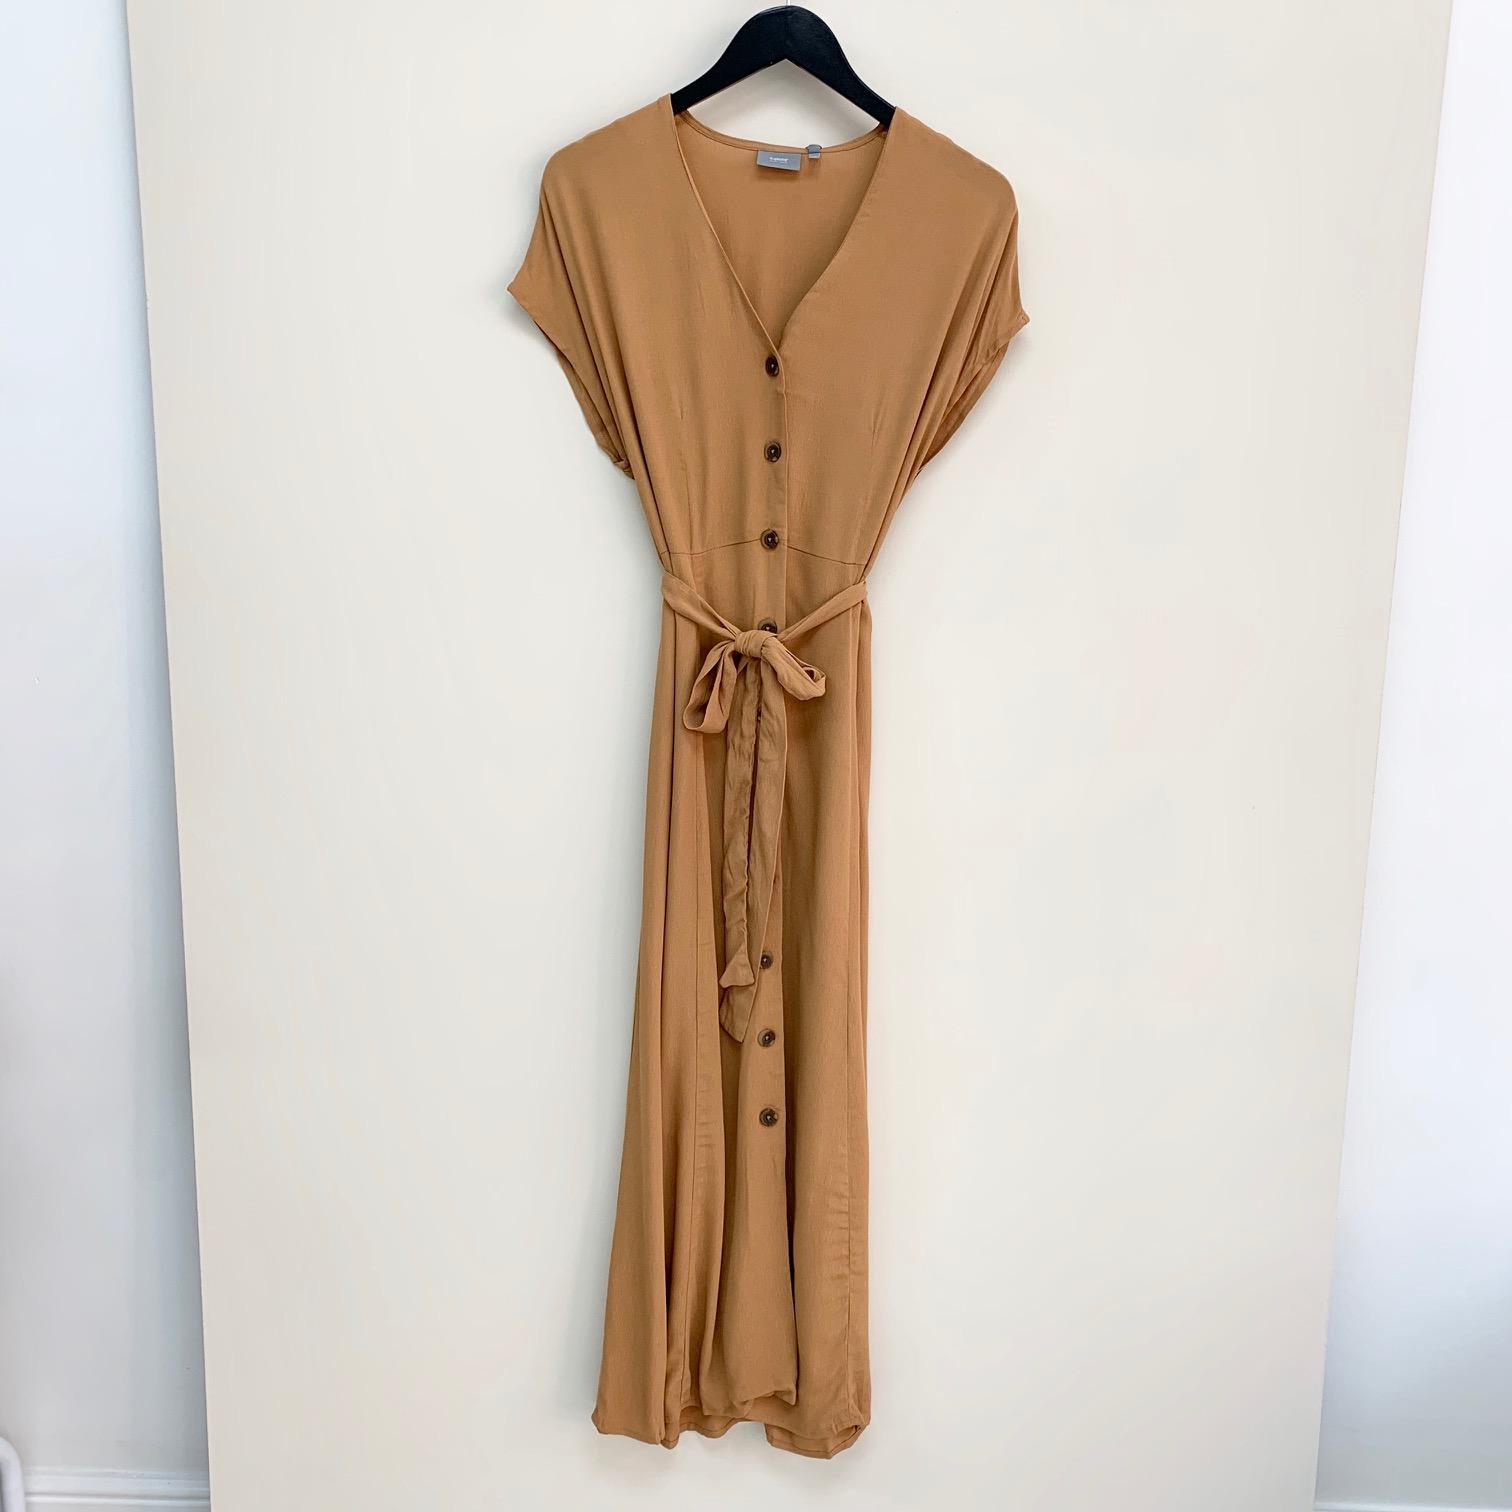 SALE Fatima Midi Dress was £69.99